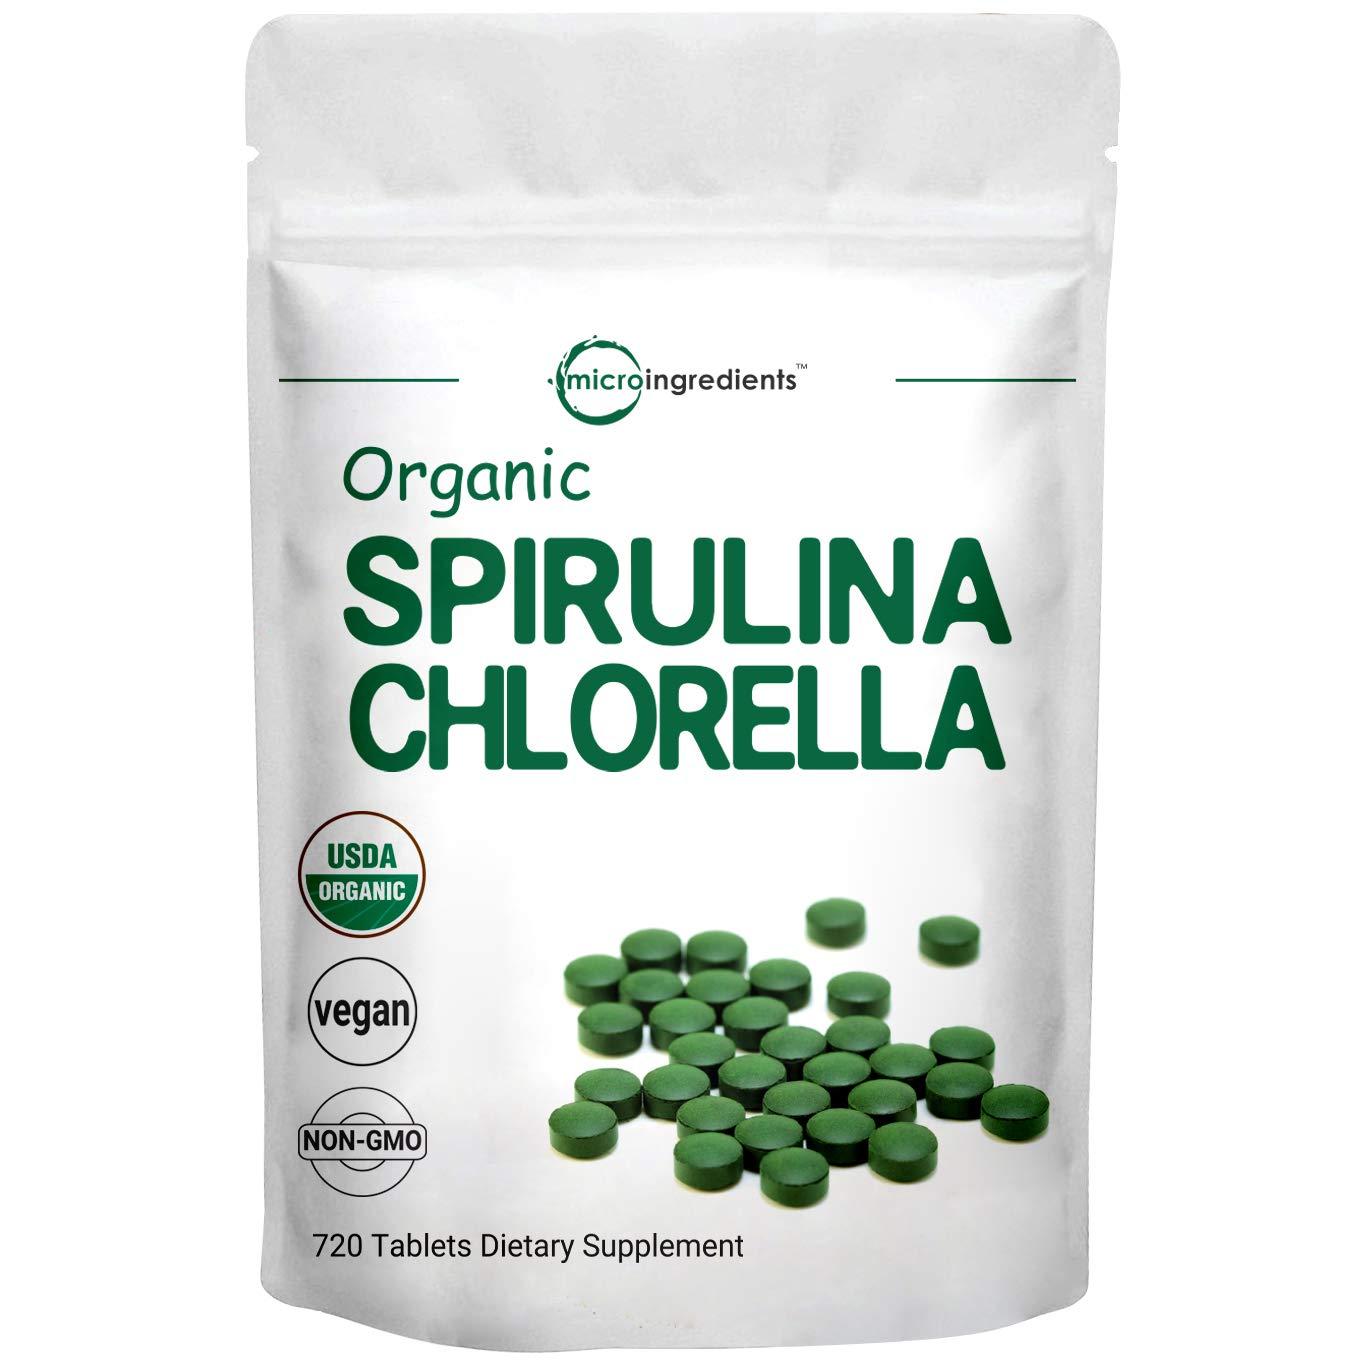 Organic Chlorella Spirulina Tablets, 3000mg Per Serving, 720 Counts, 120 Servings (4 Months Supply), Rich in Chlorophyll, Prebiotics, Immune Vitamins, Fiber, Proteins, No GMOs, Vegan